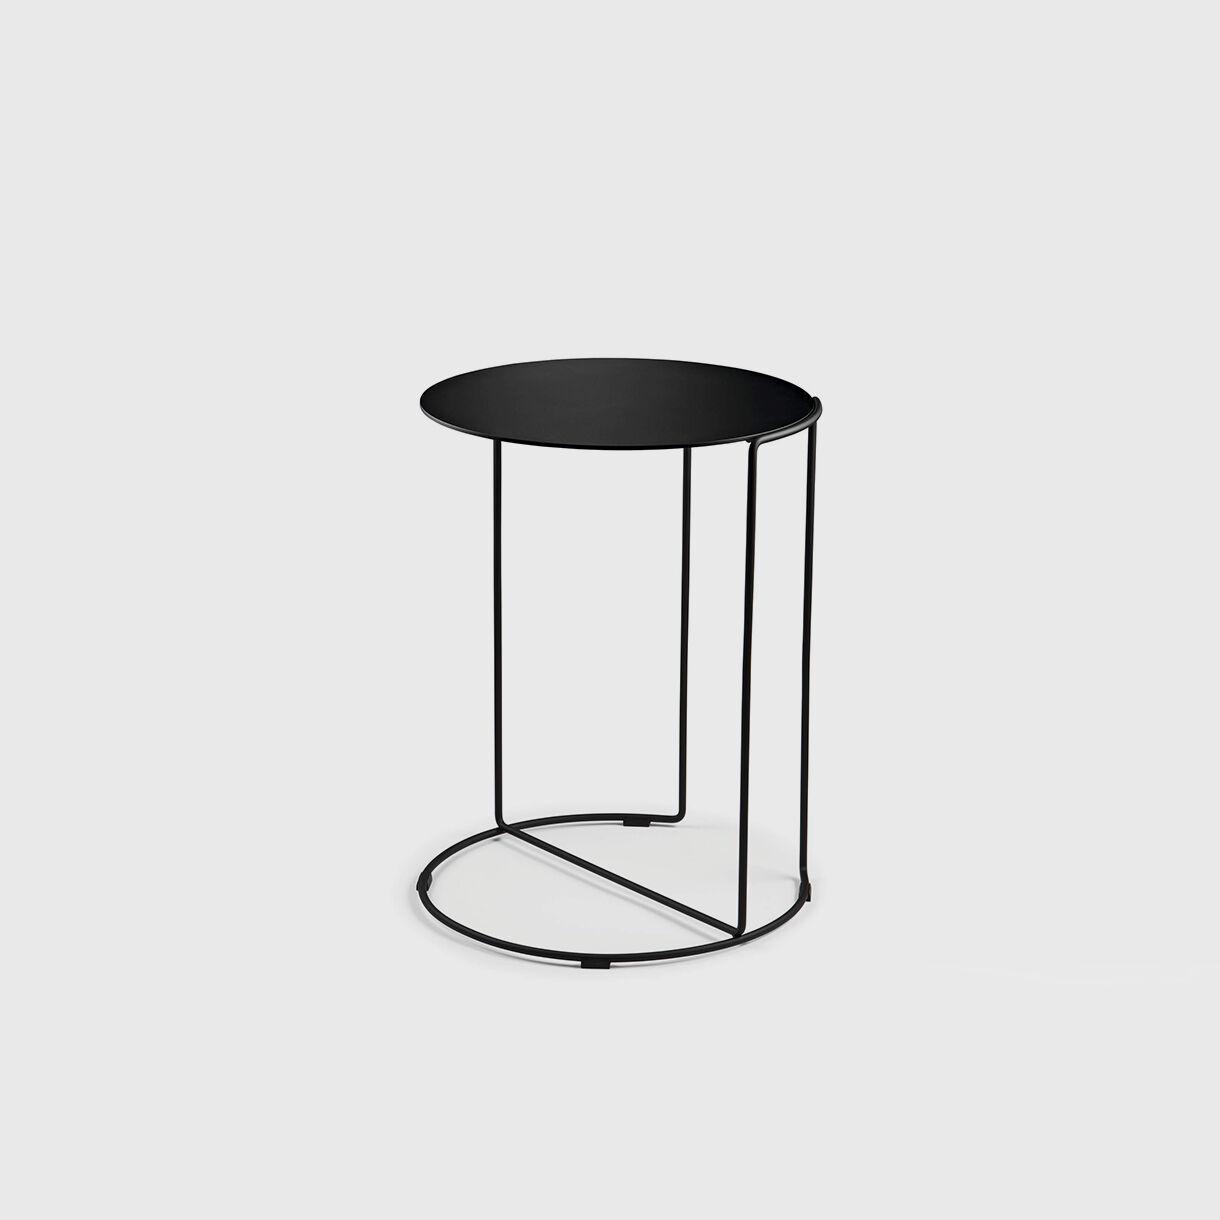 Oki Round Side Table, T4, Black